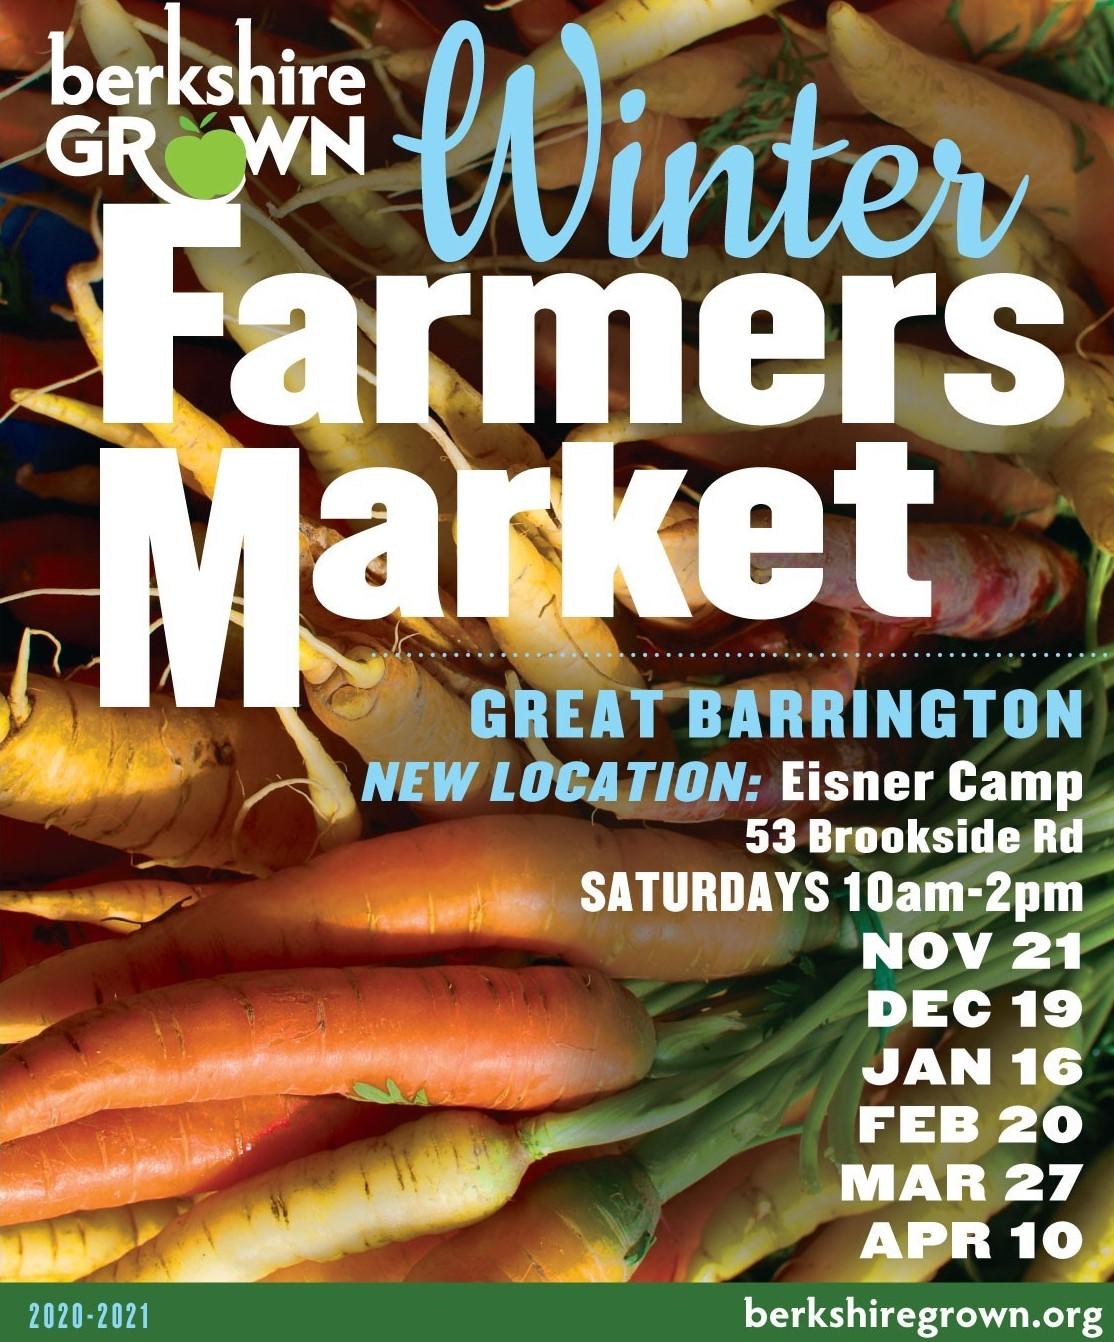 Berkshire Grown Great Barrington Winter Farmers Markets